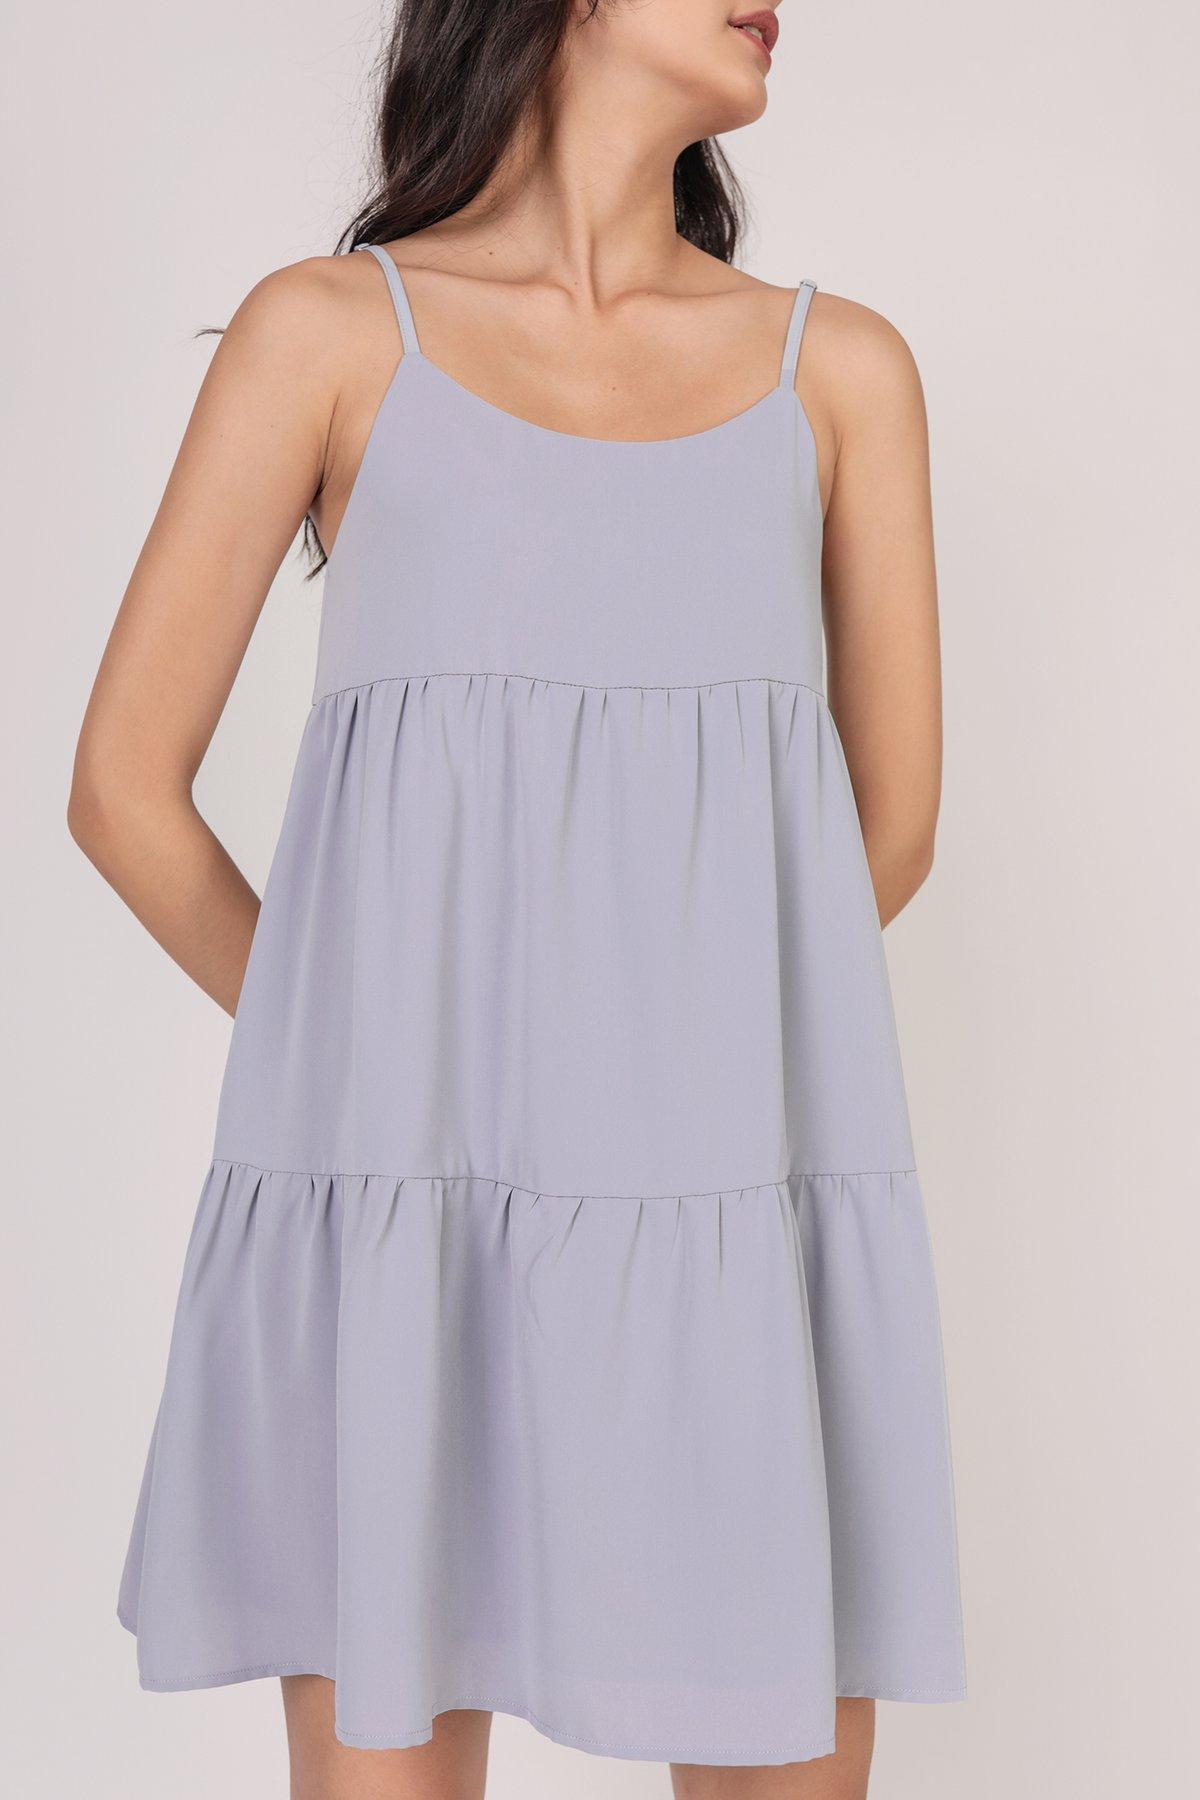 Emmy Tiered Spag Dress (Grey)